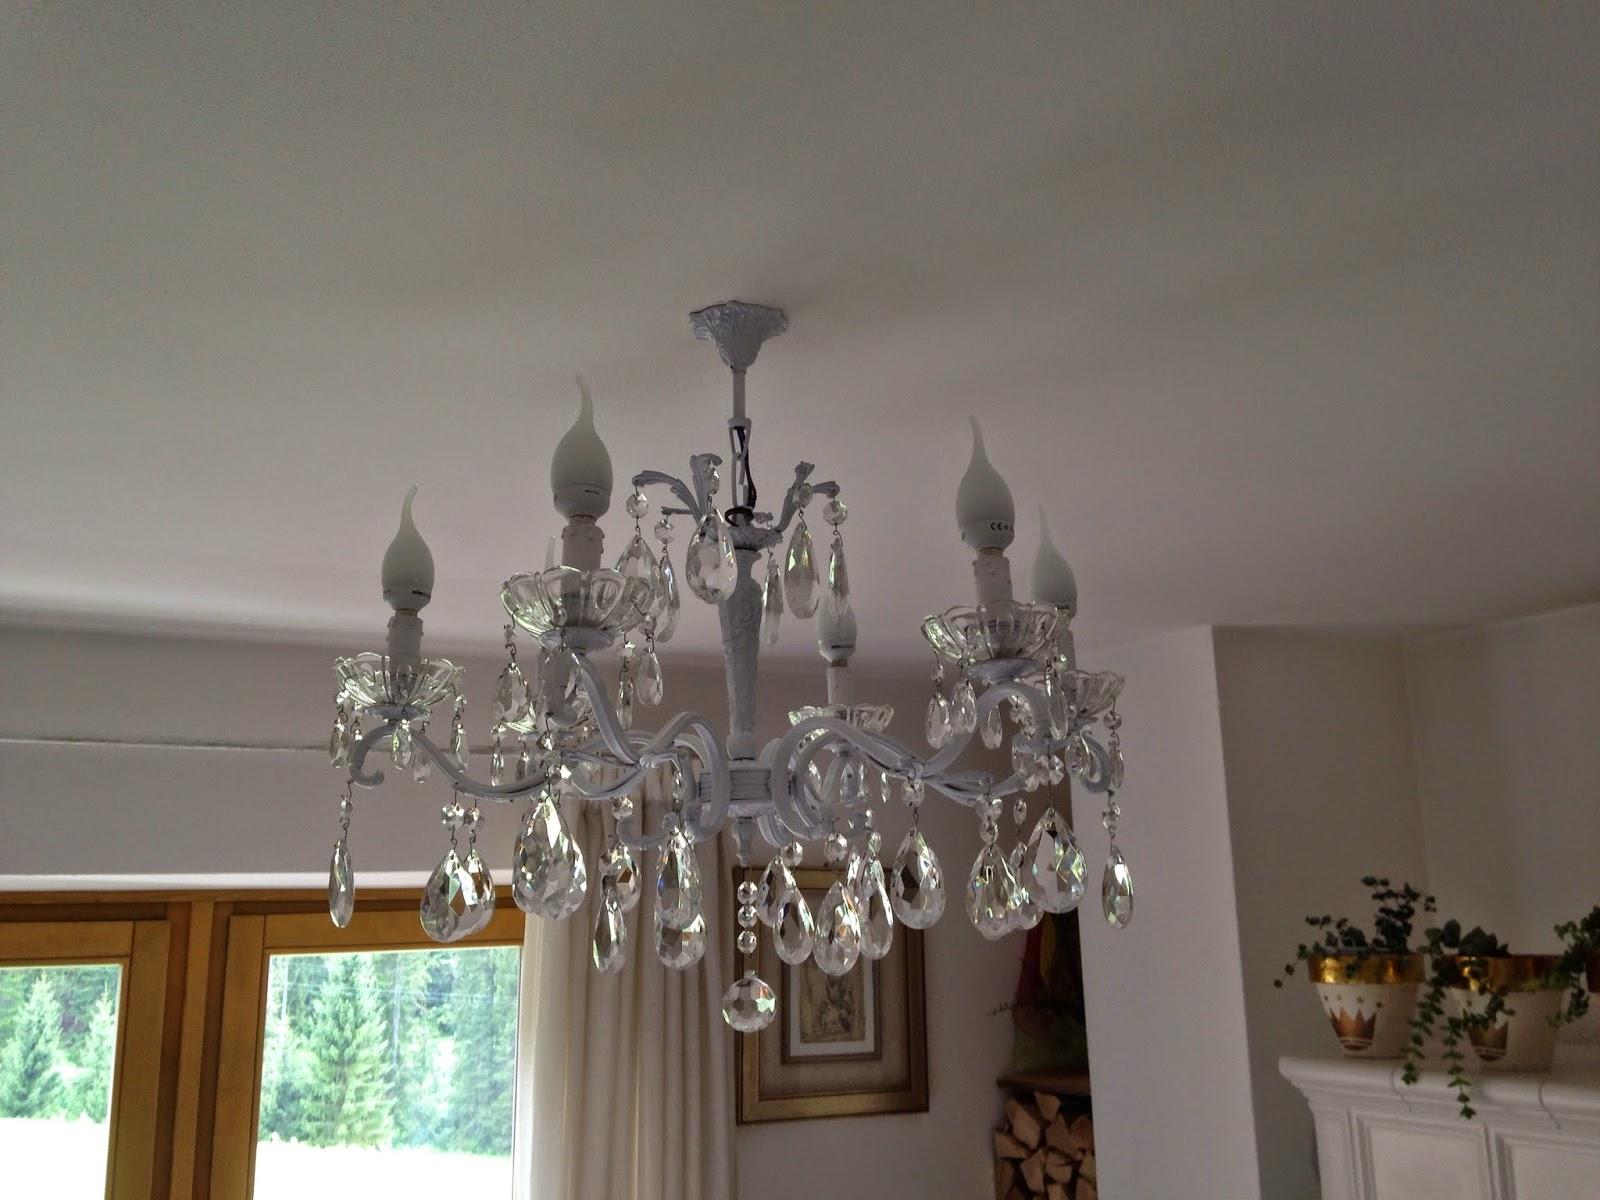 Lampadario Filo Di Ferro : Vendita lampadari online light plus vendita lampadari online